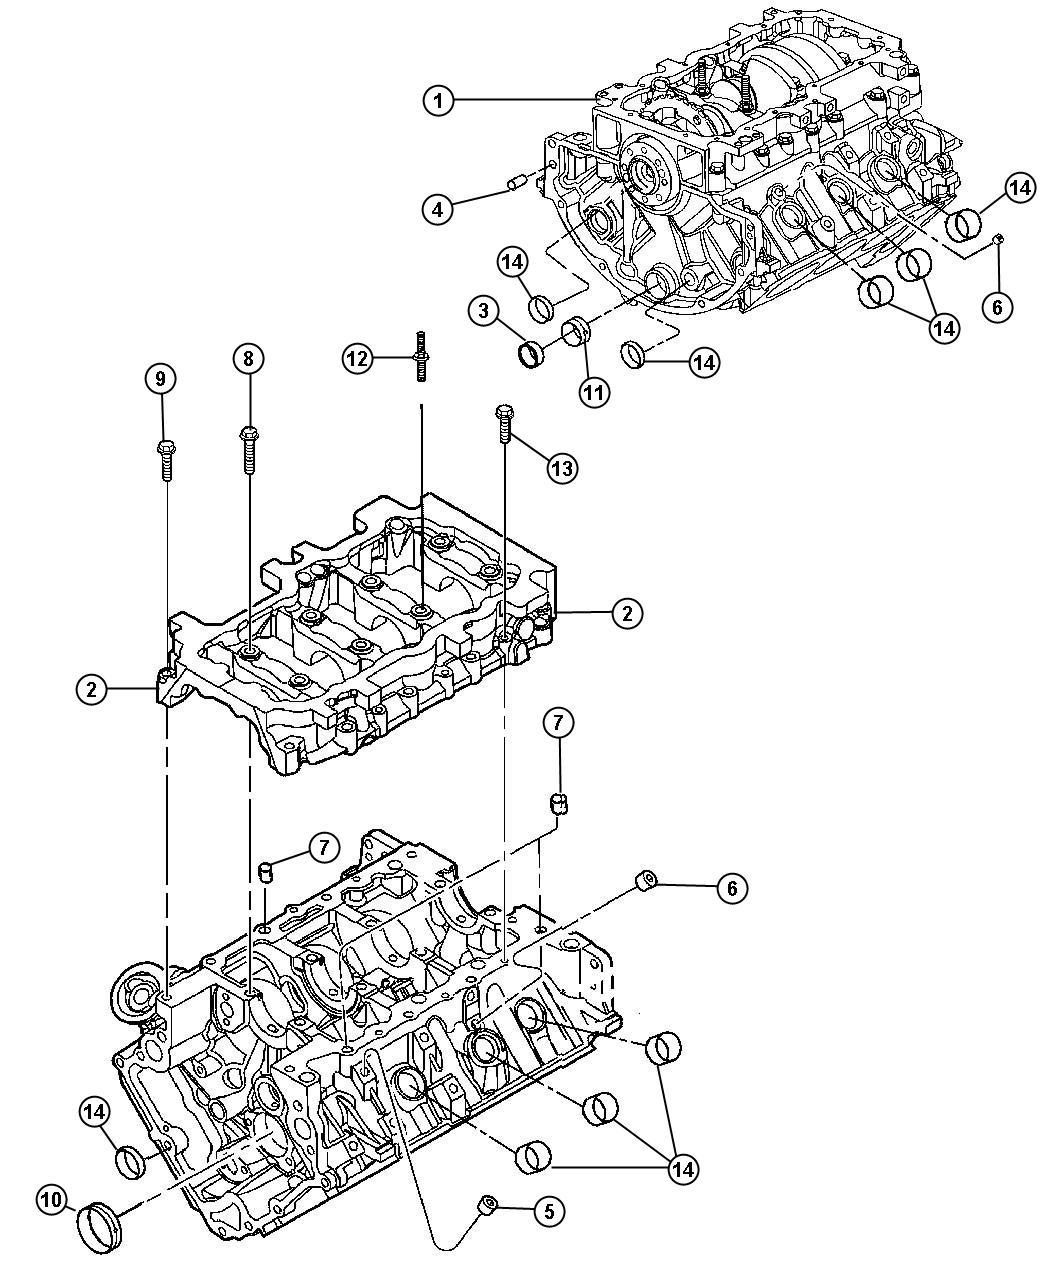 Dodge Dakota Engine Short Block